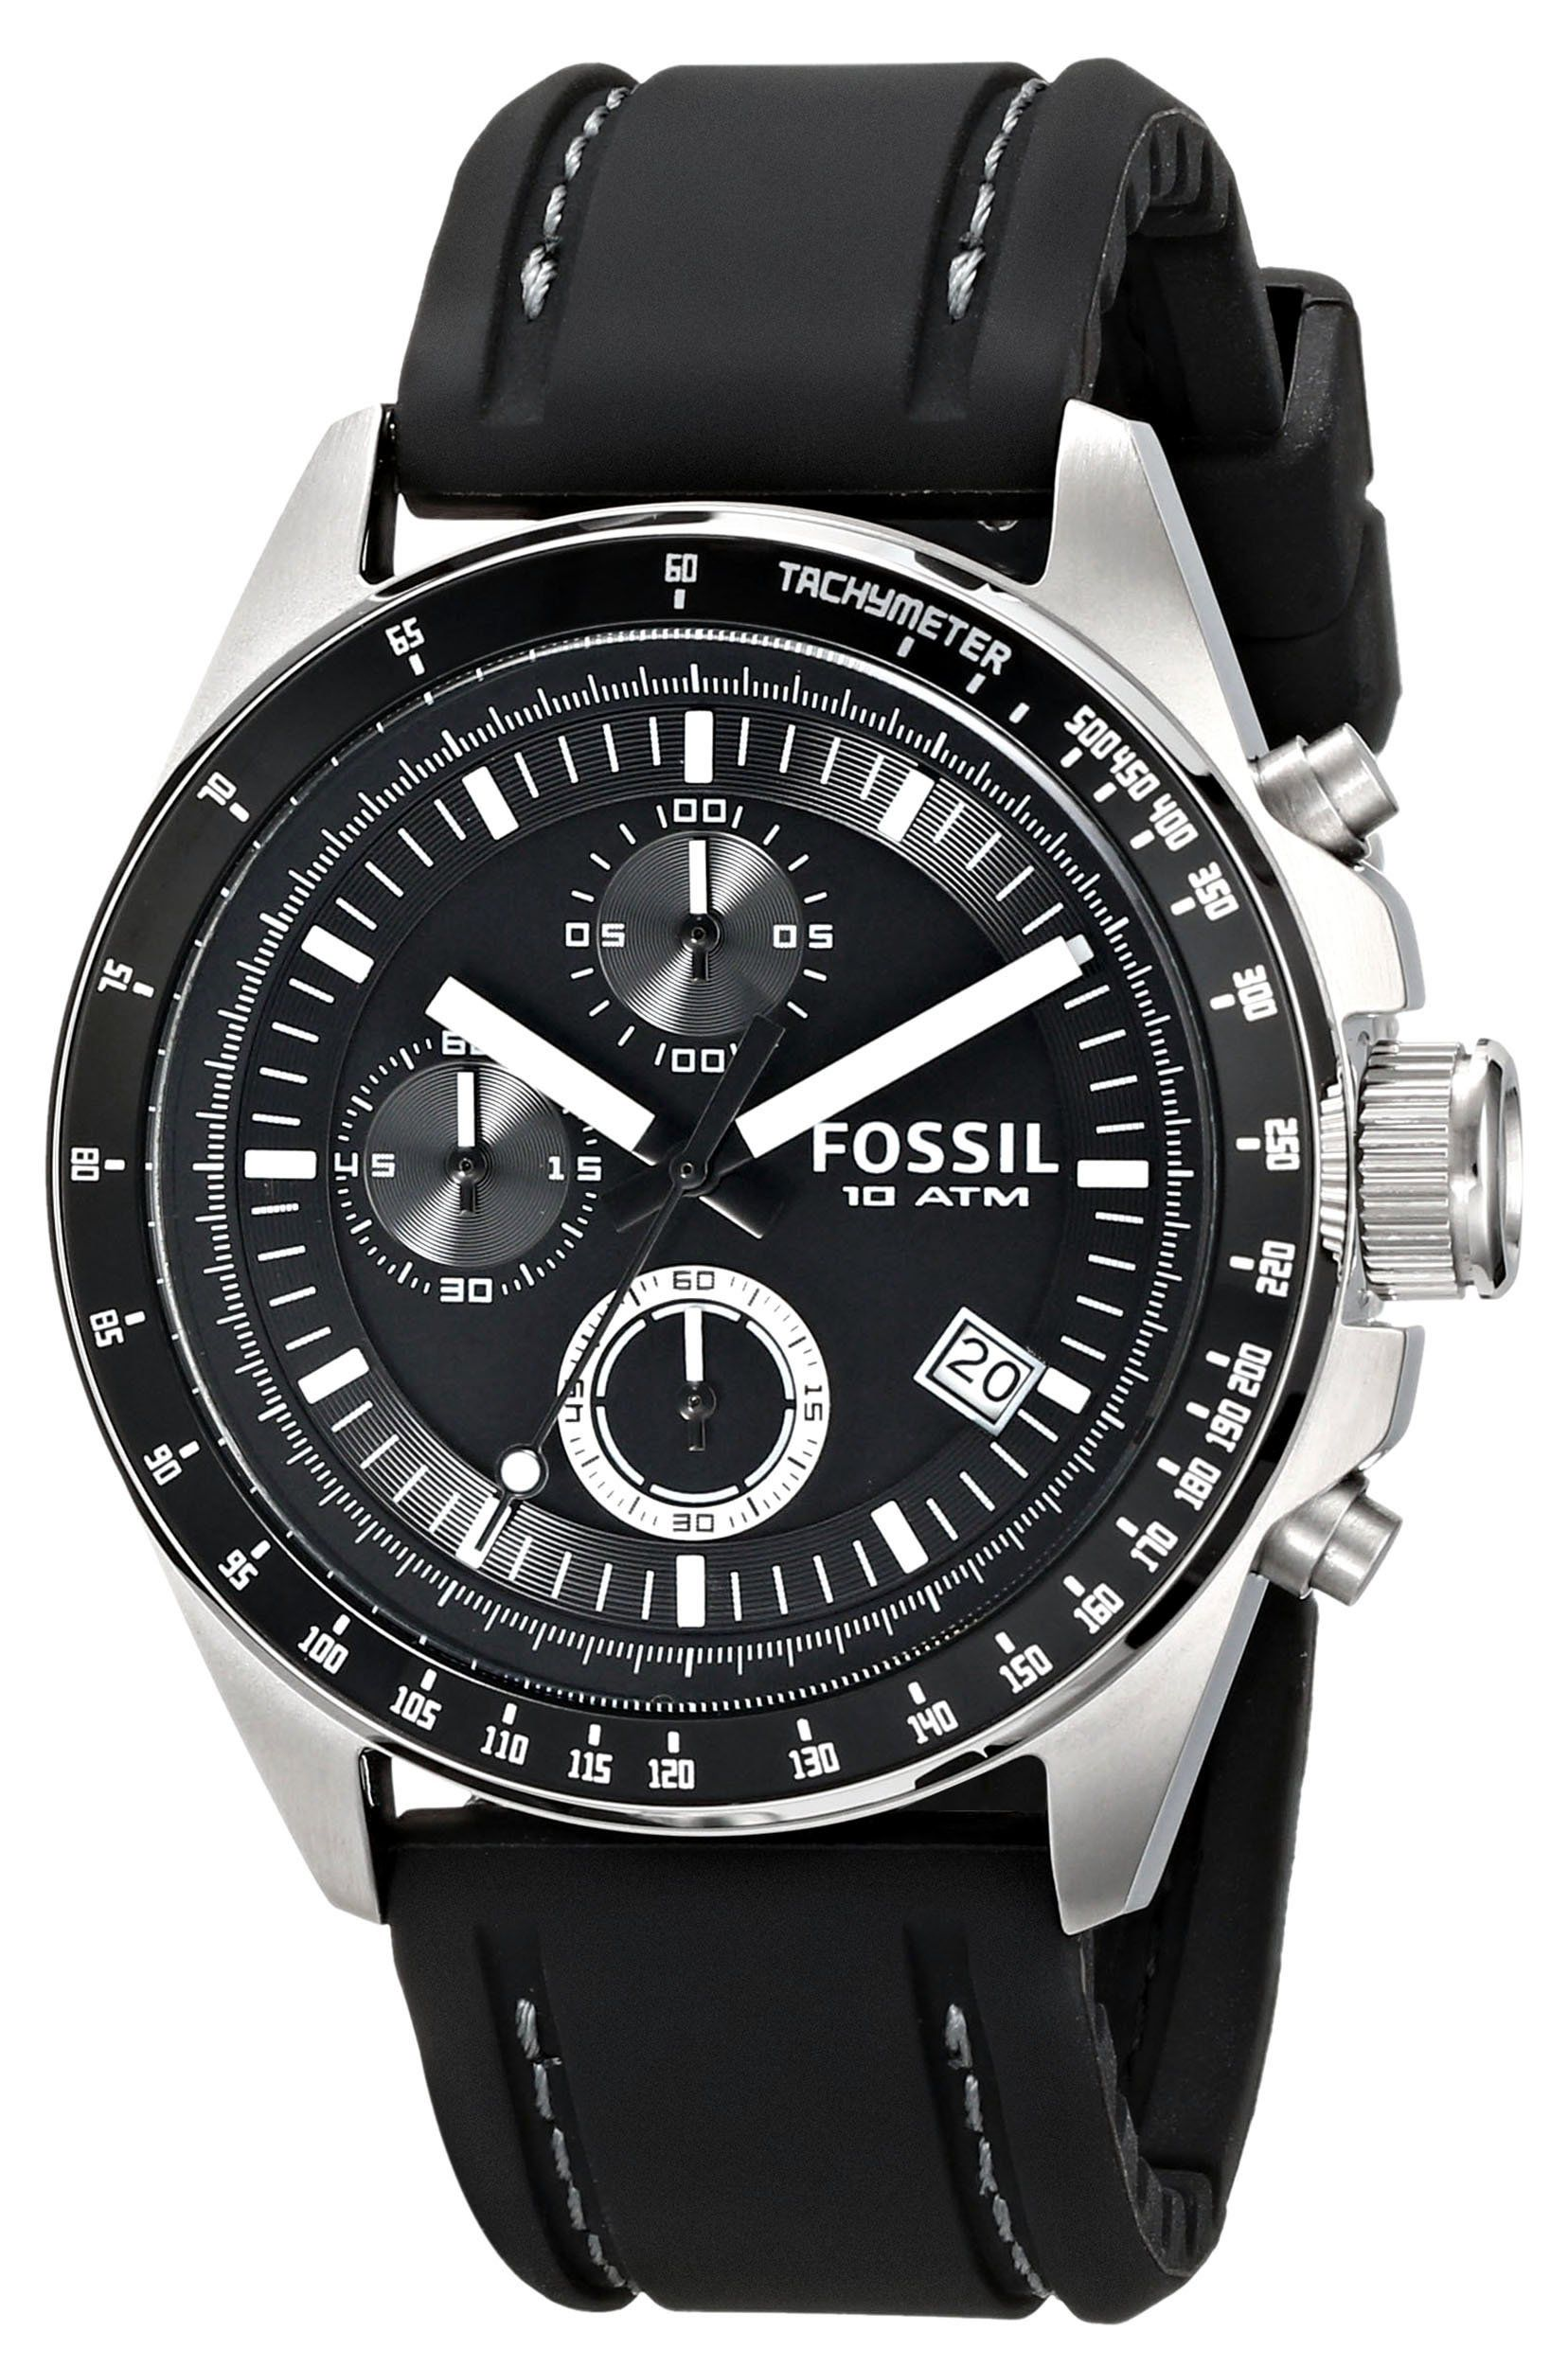 683832e1d196 Fossil CH2573 - Reloj analógico de cuarzo para hombre con correa de piel